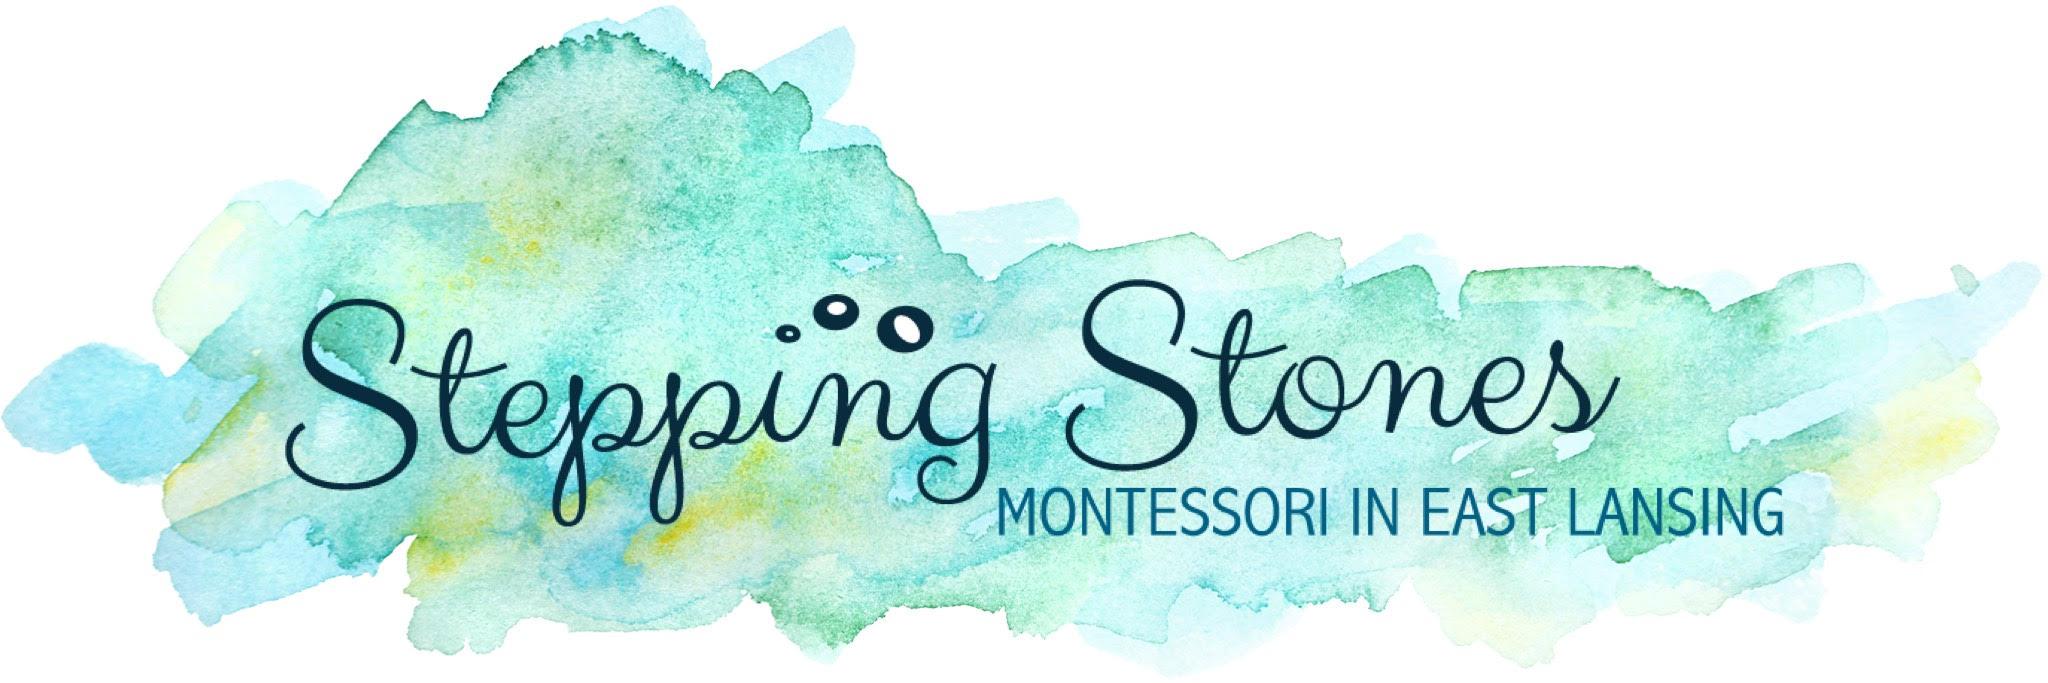 Stepping Stones Montessori in East Lansing